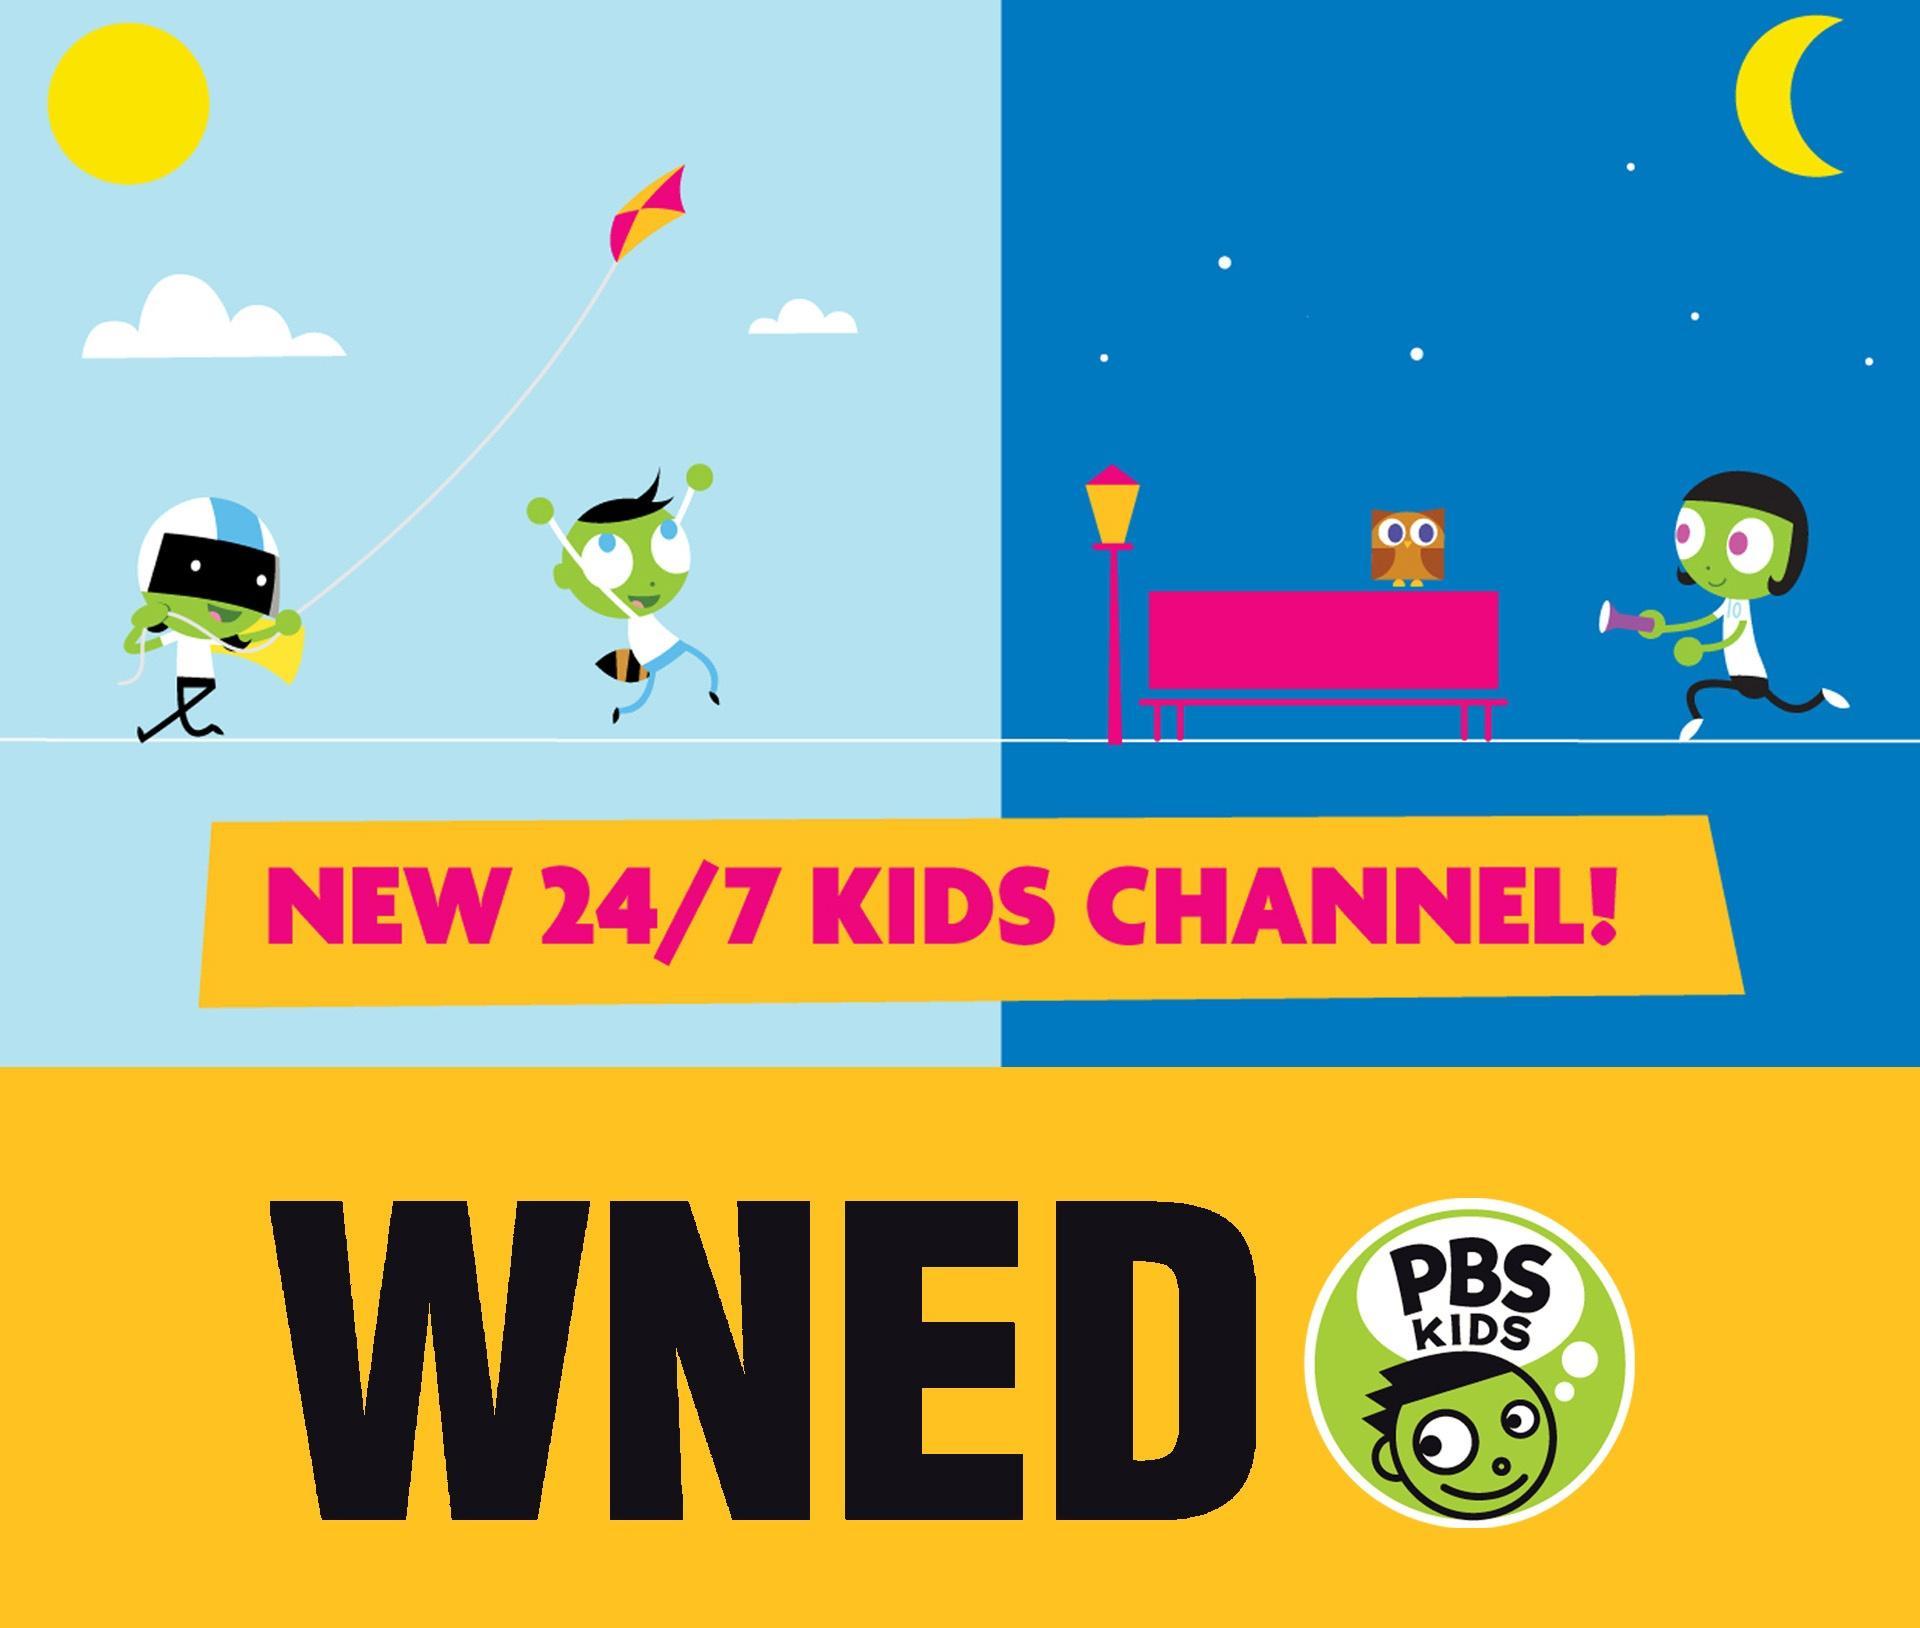 WNED PBS KIDS 24/7